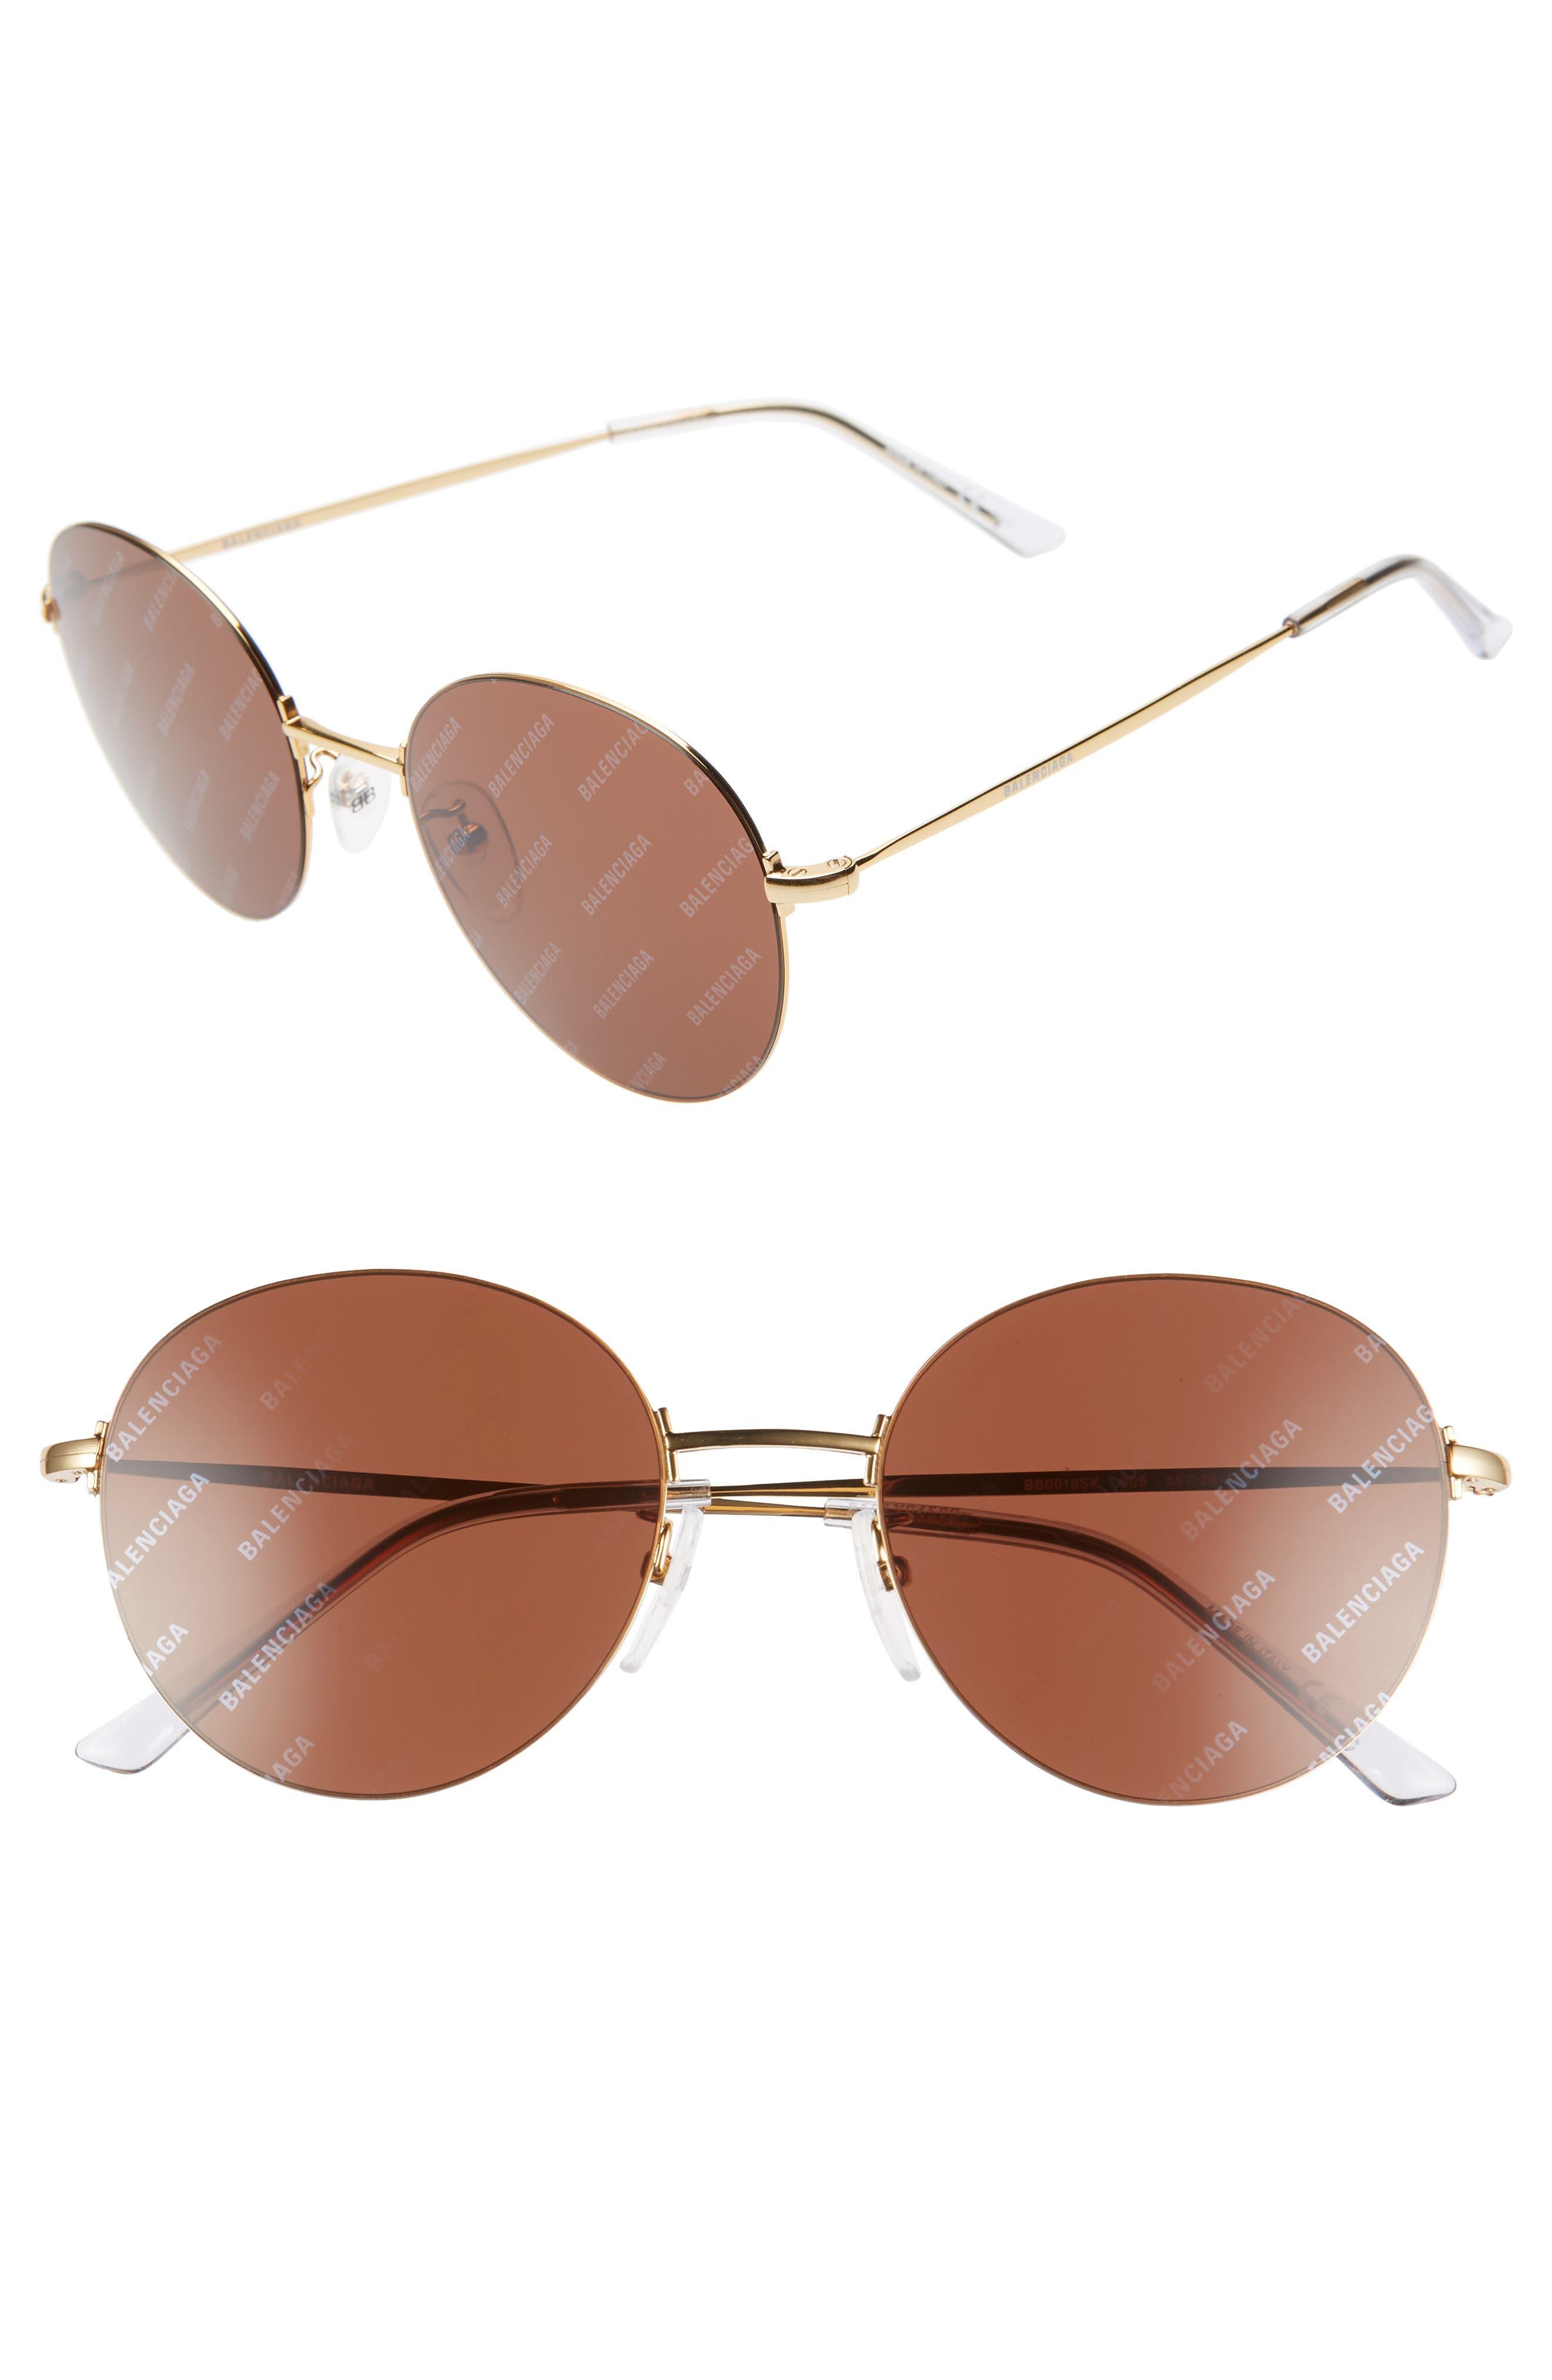 7f5c31bb4a1 Balenciaga 55Mm Round Sunglasses - Shiny Endura Gold  Brown